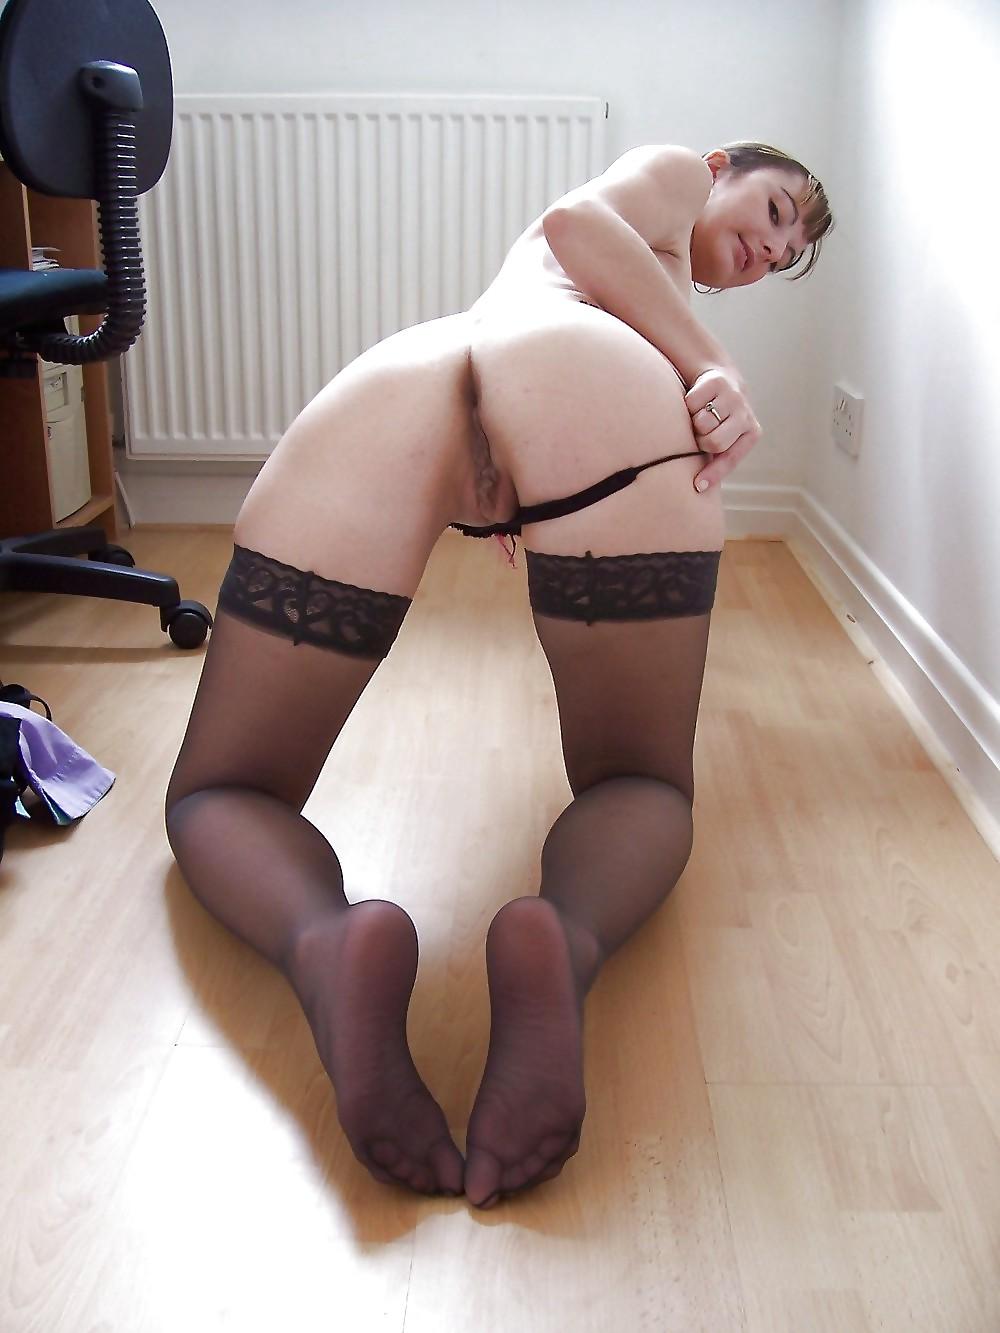 Jeune libertine dans sa chambre - 2 9